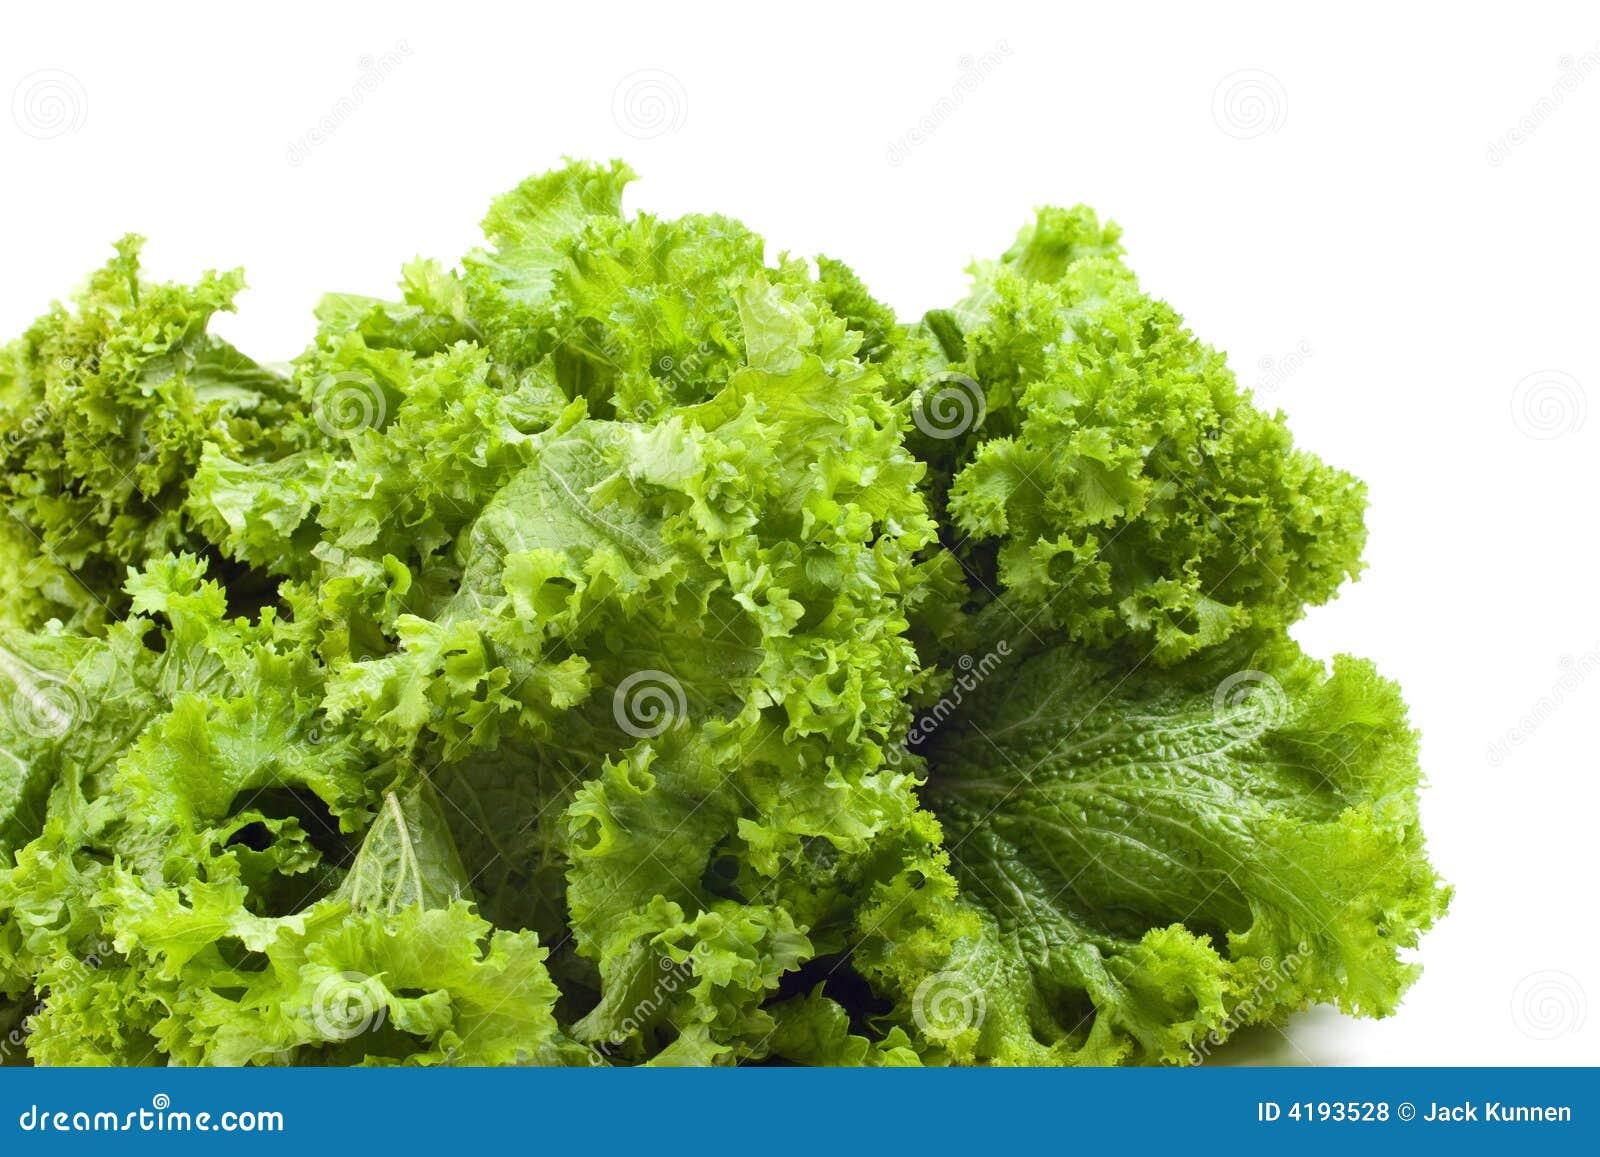 ... mustard greens mustard greens are fast mustard greens curled mustard